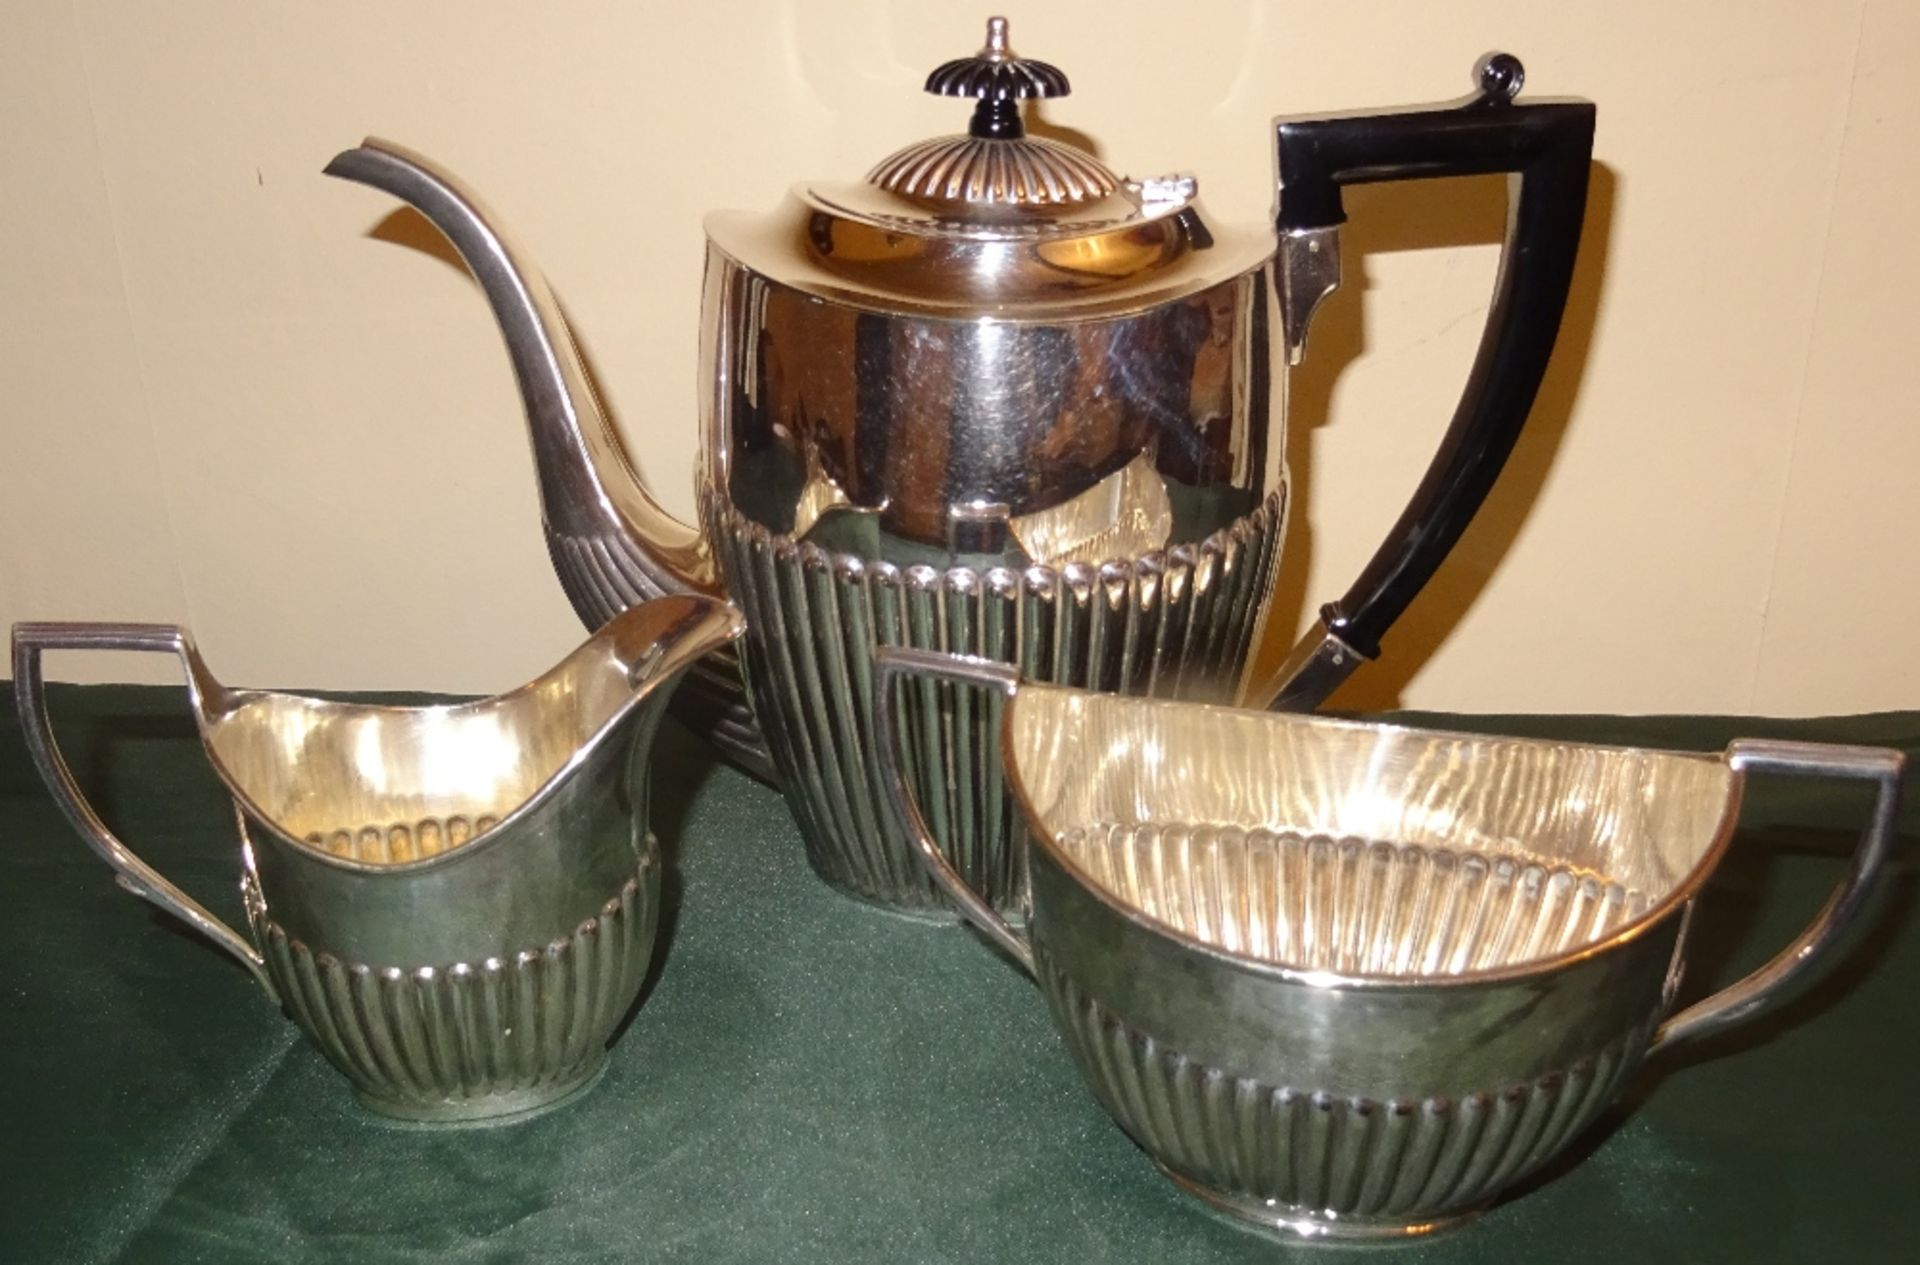 Lot 348 - SILVER PLATED TEA POT WITH MATCHING MILK JUG AND SUGAR BOWL